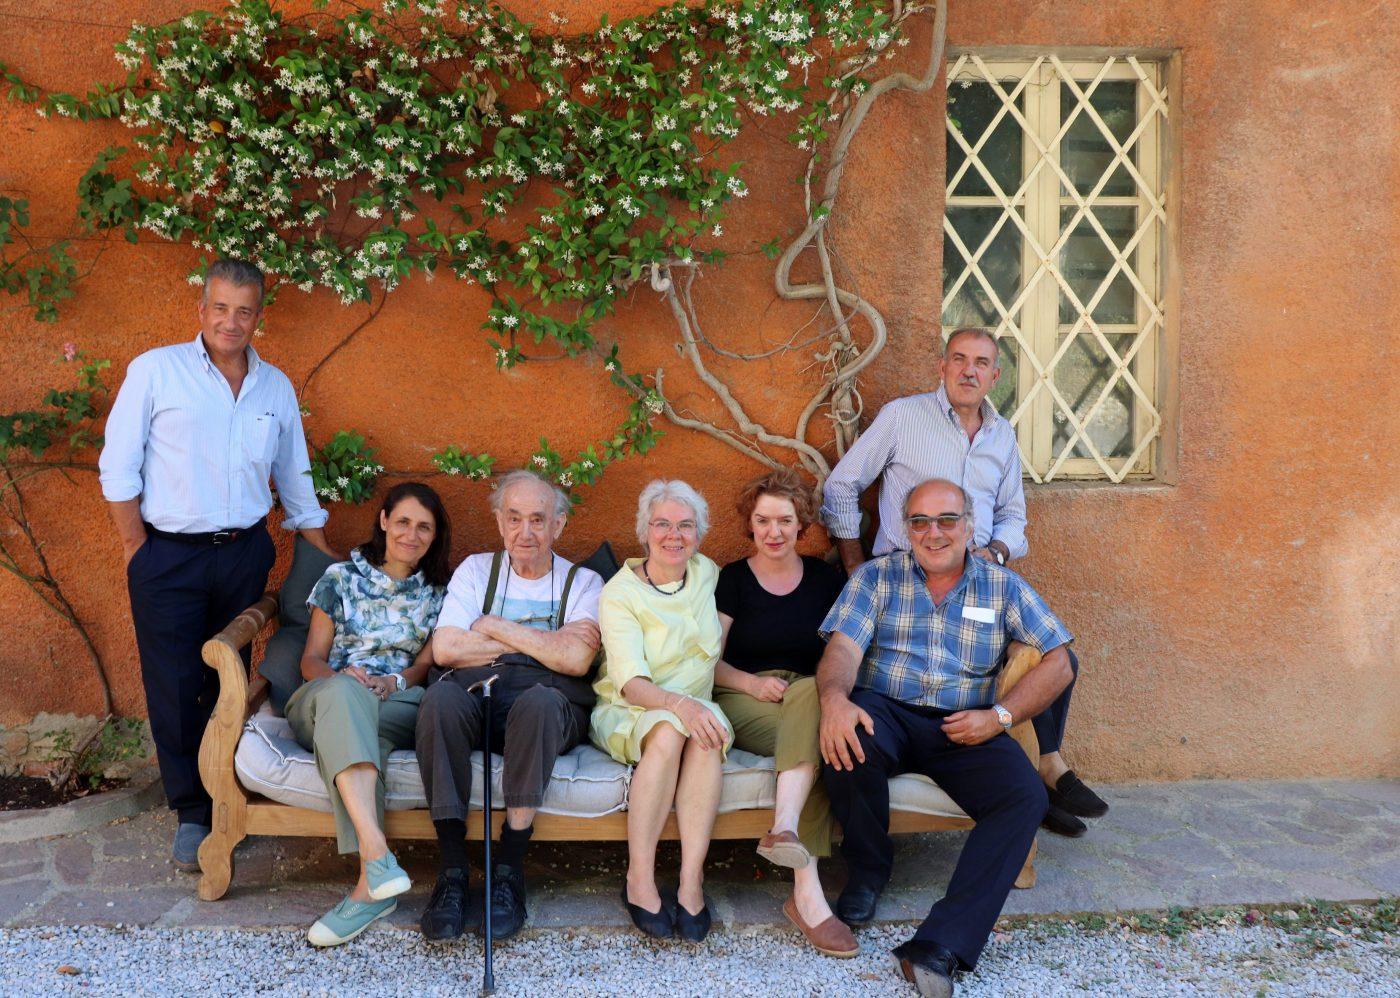 Fondazione Giardino Daniel Spoerri